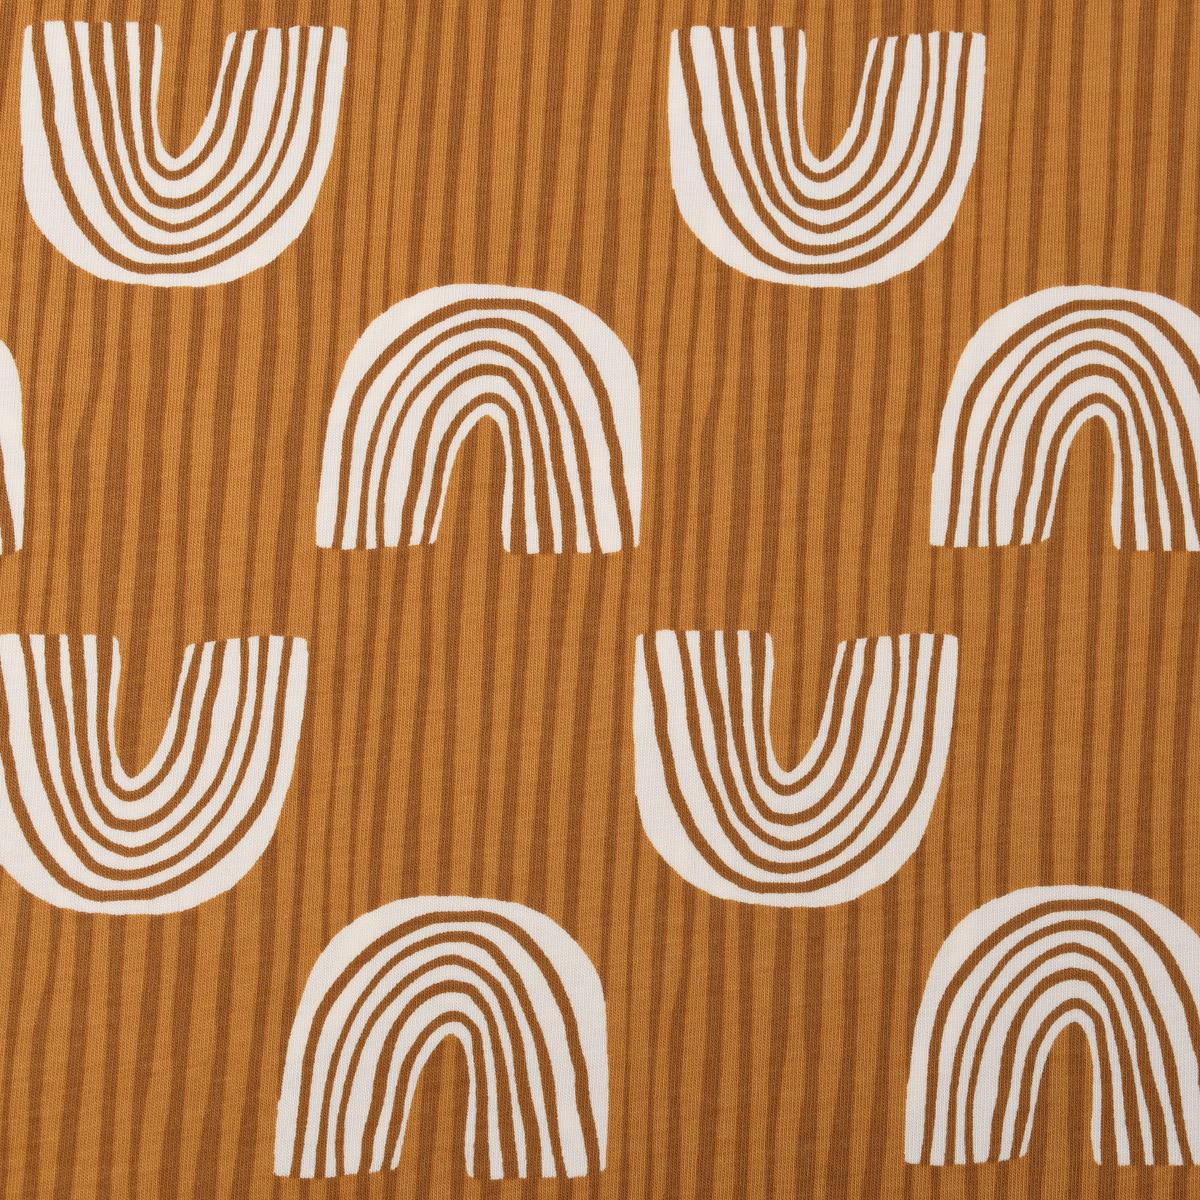 Baumwolljersey Jersey Regenbogen gestreift ocker weiß 1,5m Breite